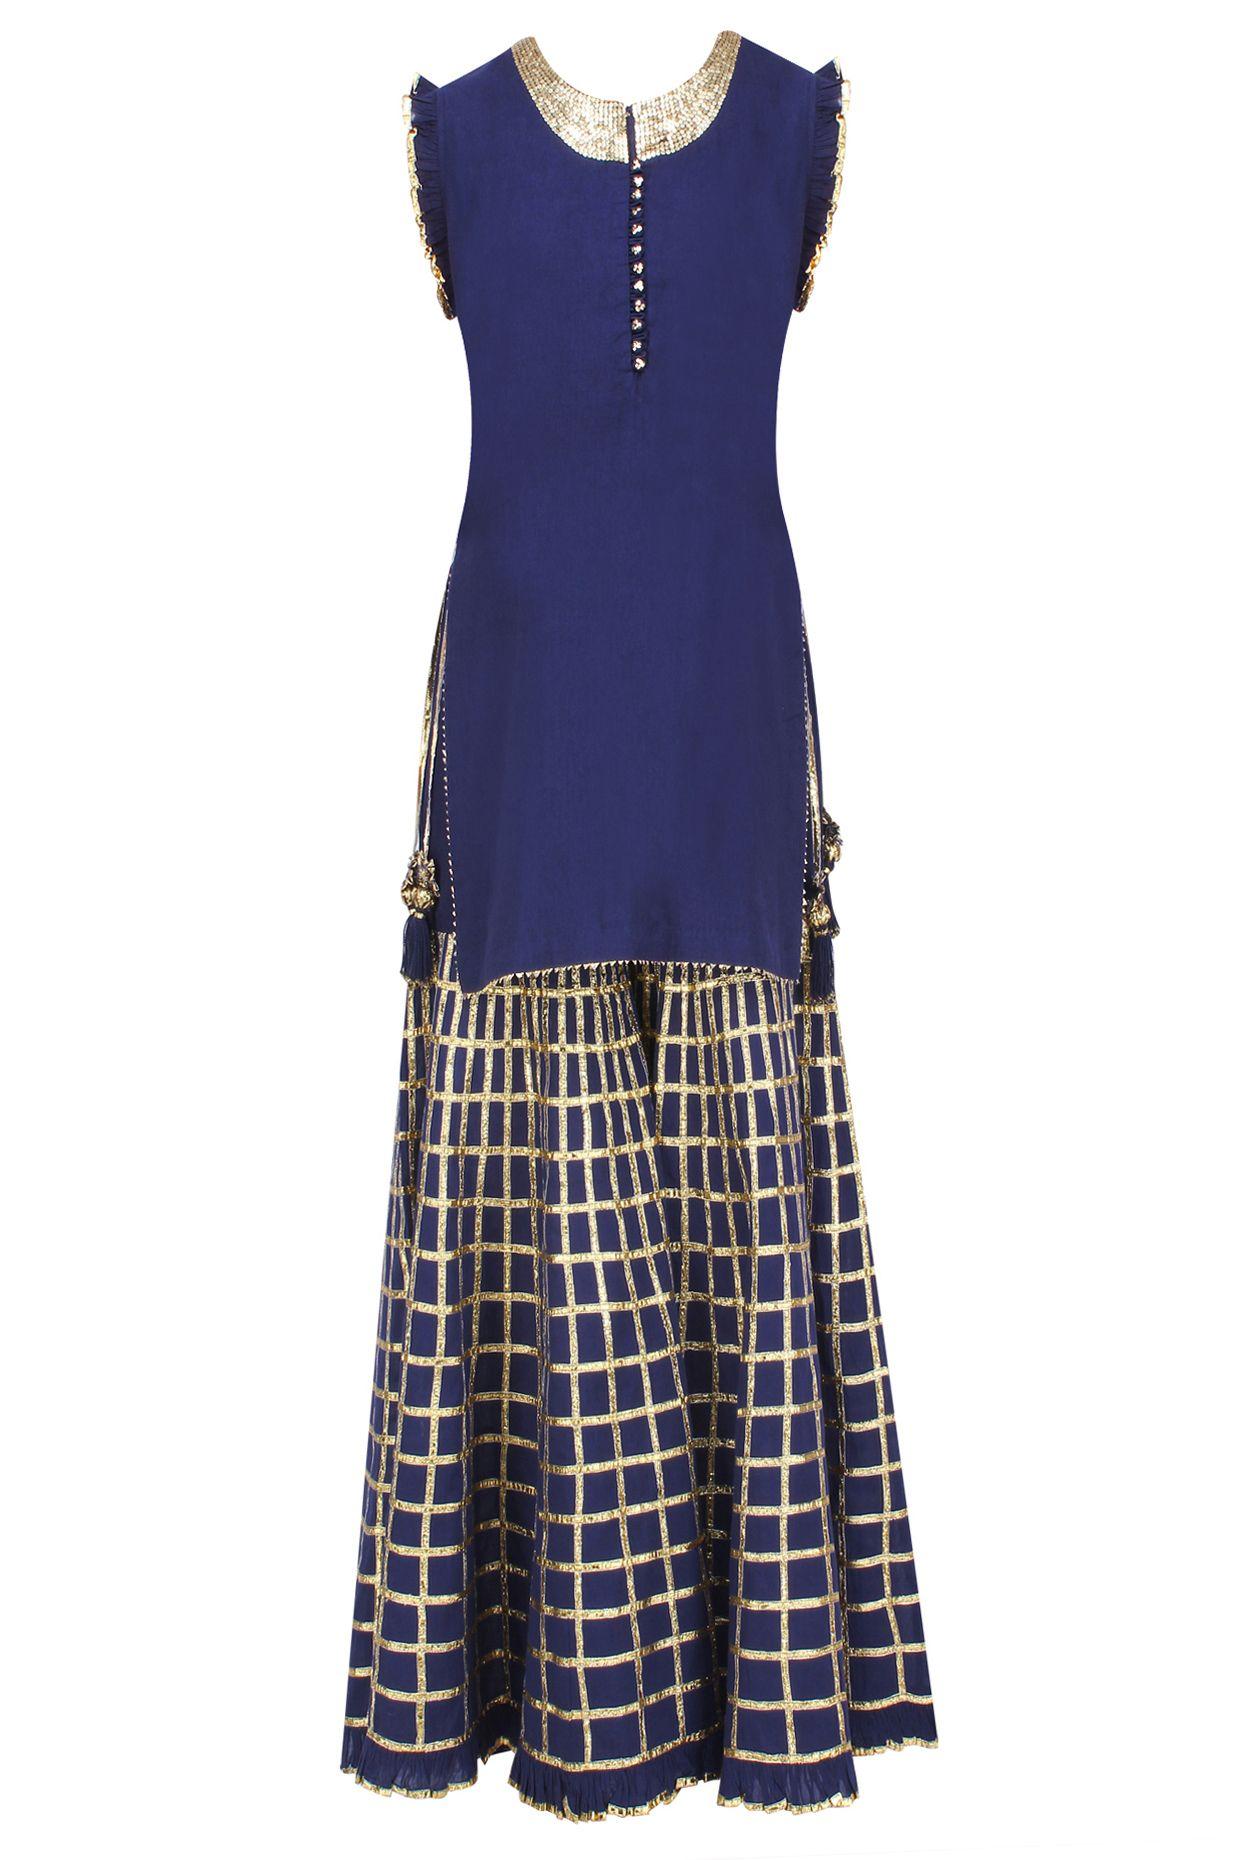 Navy blue gota patti work kurta and sharara pants set available only at Pernia's Pop Up Shop.